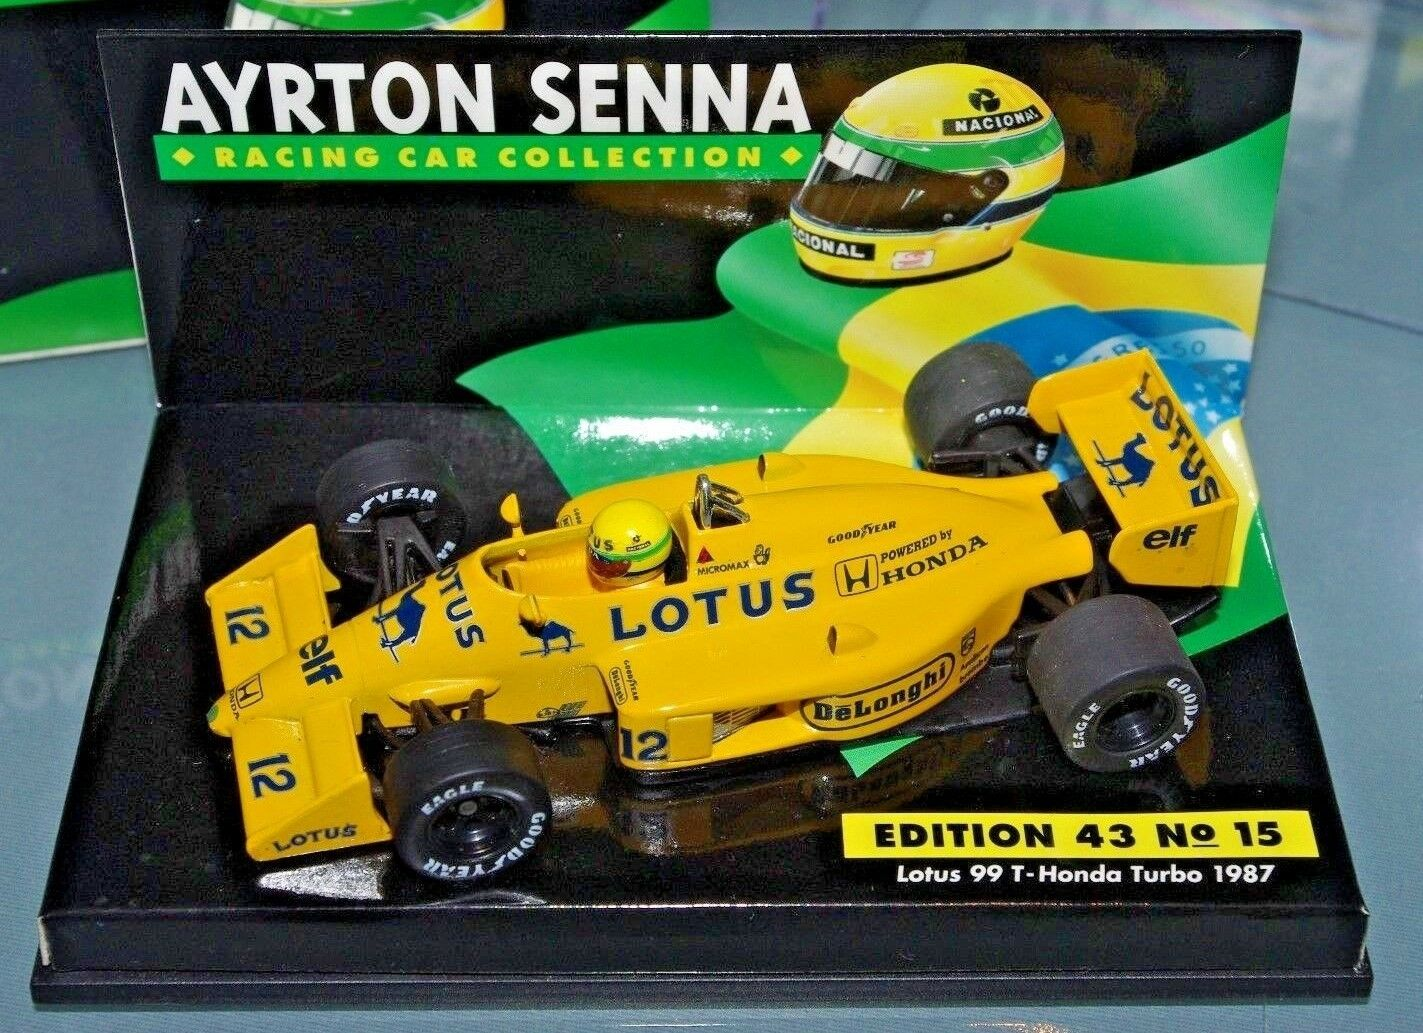 Minichamps F1  LOTUS 99 Honda Turbo 1987-AYRTON SENNA COLLEZIONE  15